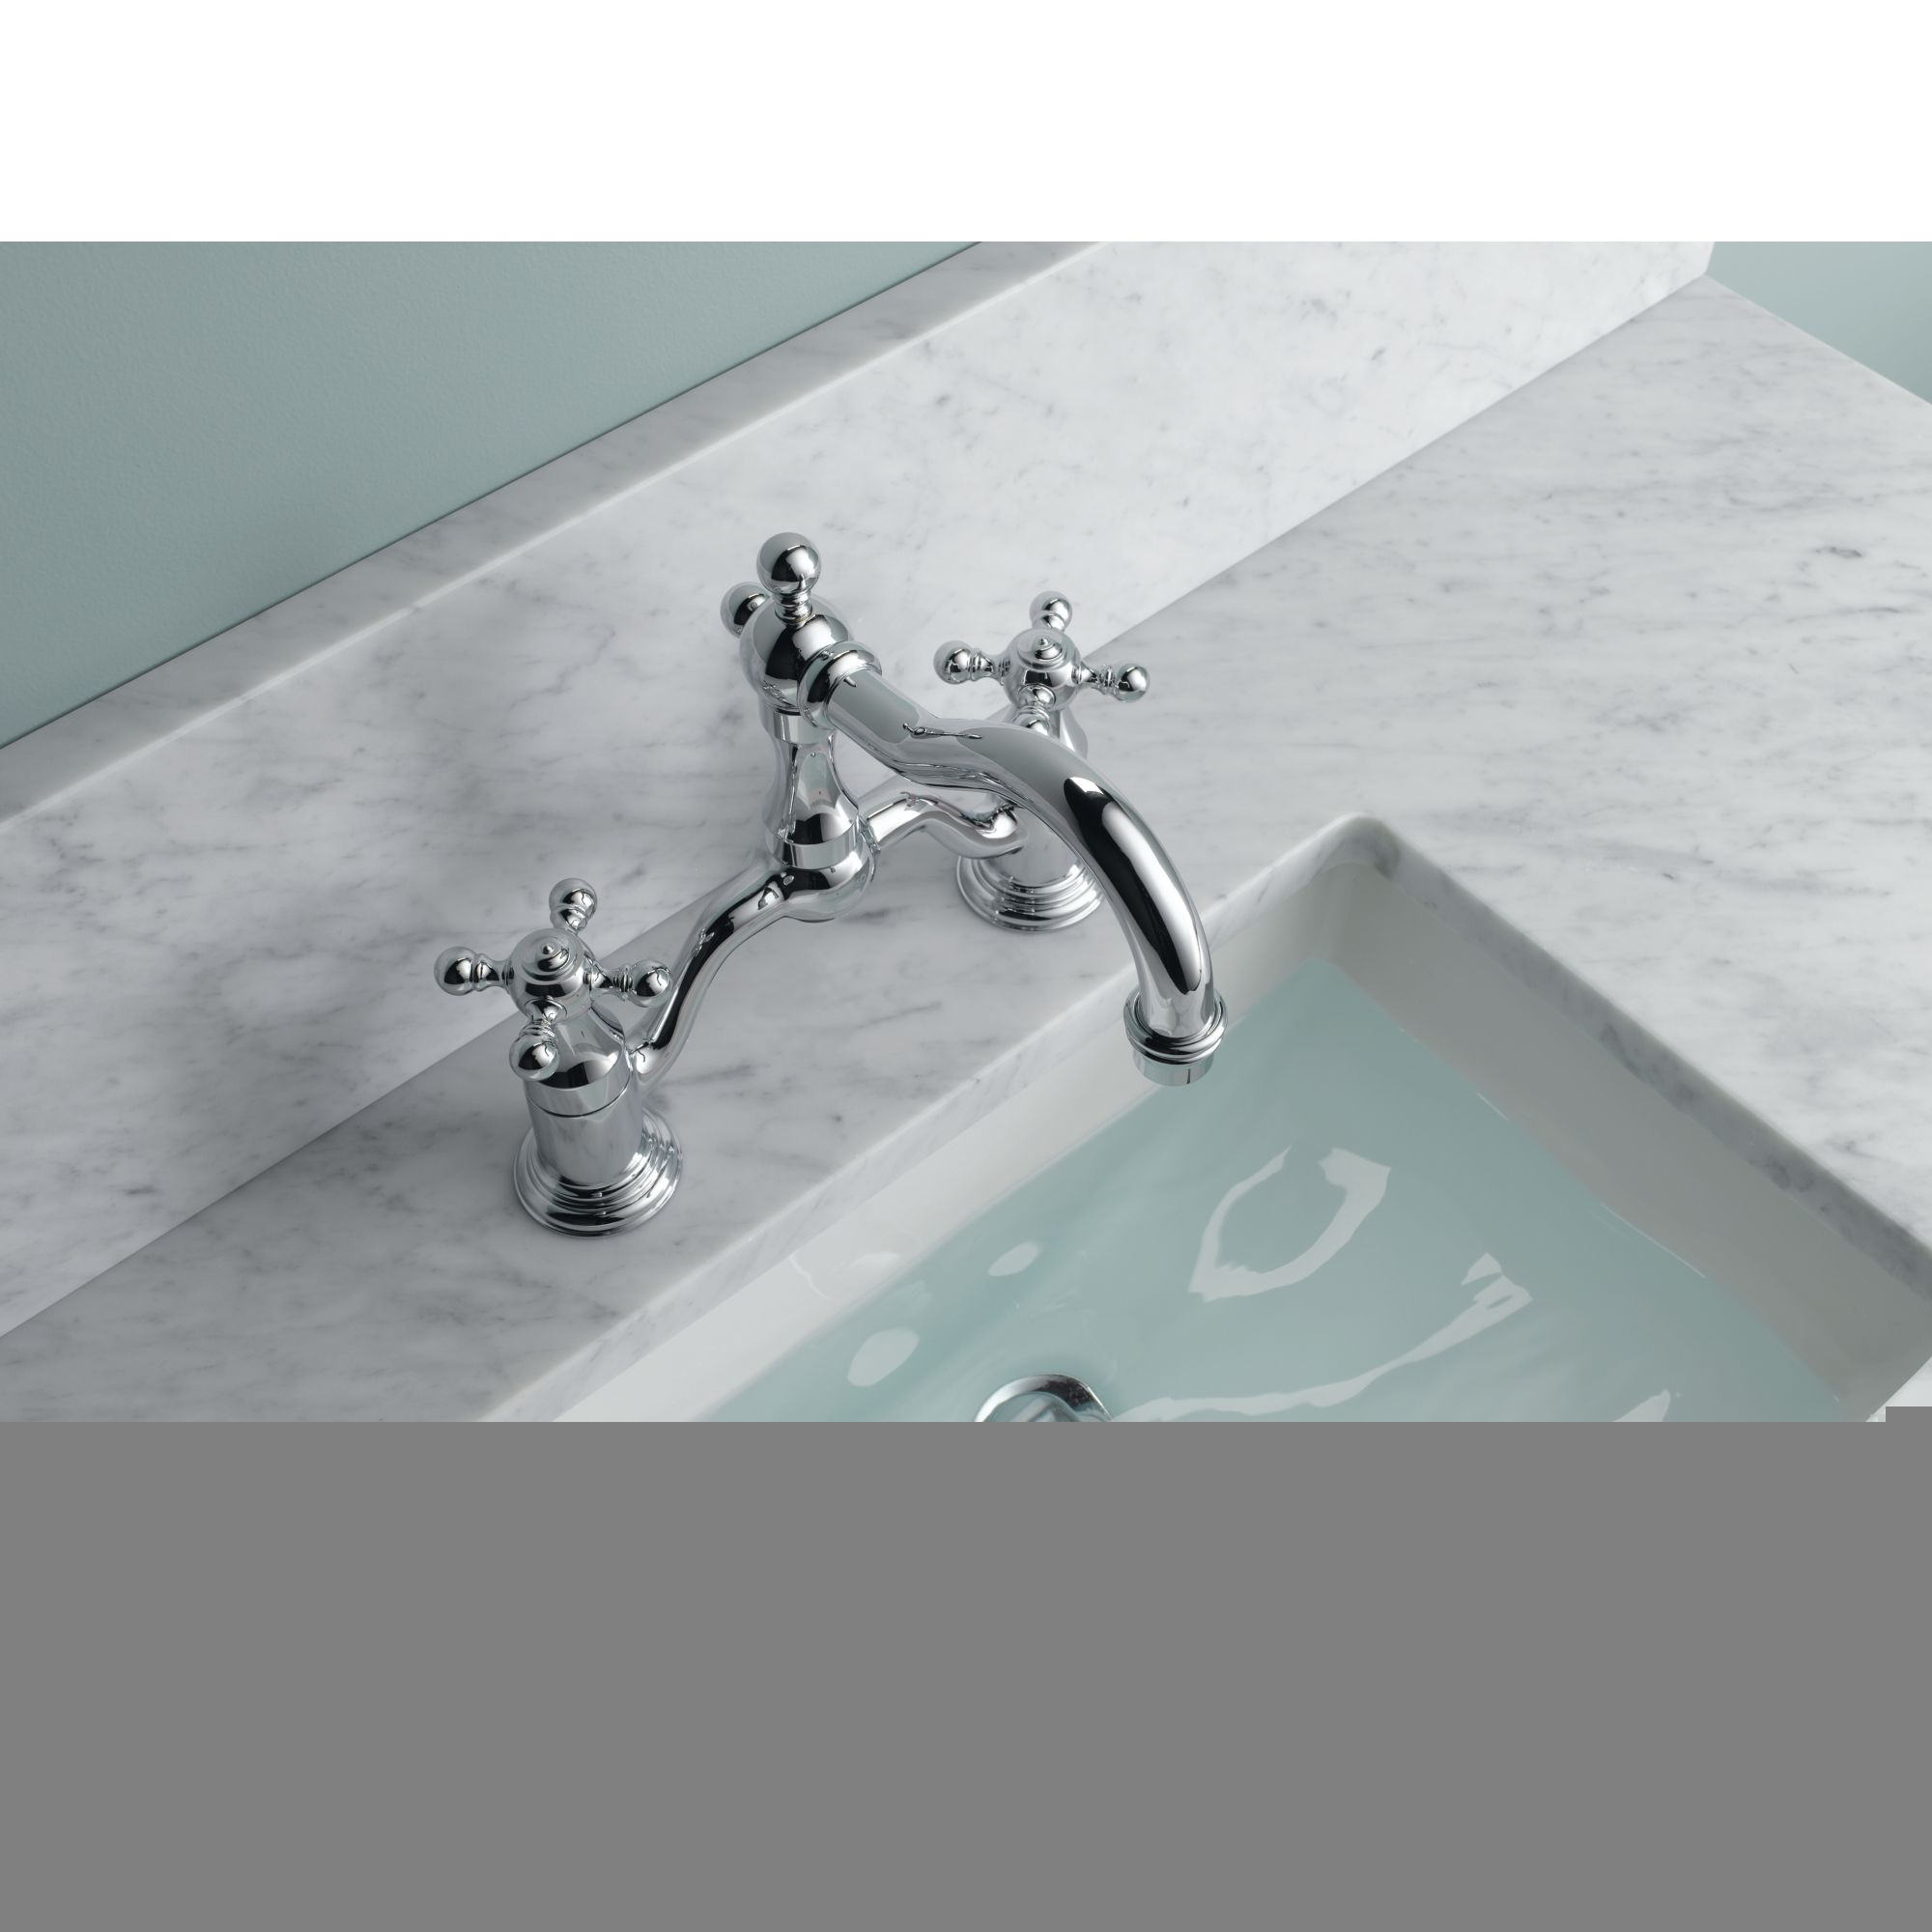 Brizo 65538lf Pc Chrome Tresa Widespread Bridge Bathroom Faucet Includes Lifetime Warranty Less Drain Embly